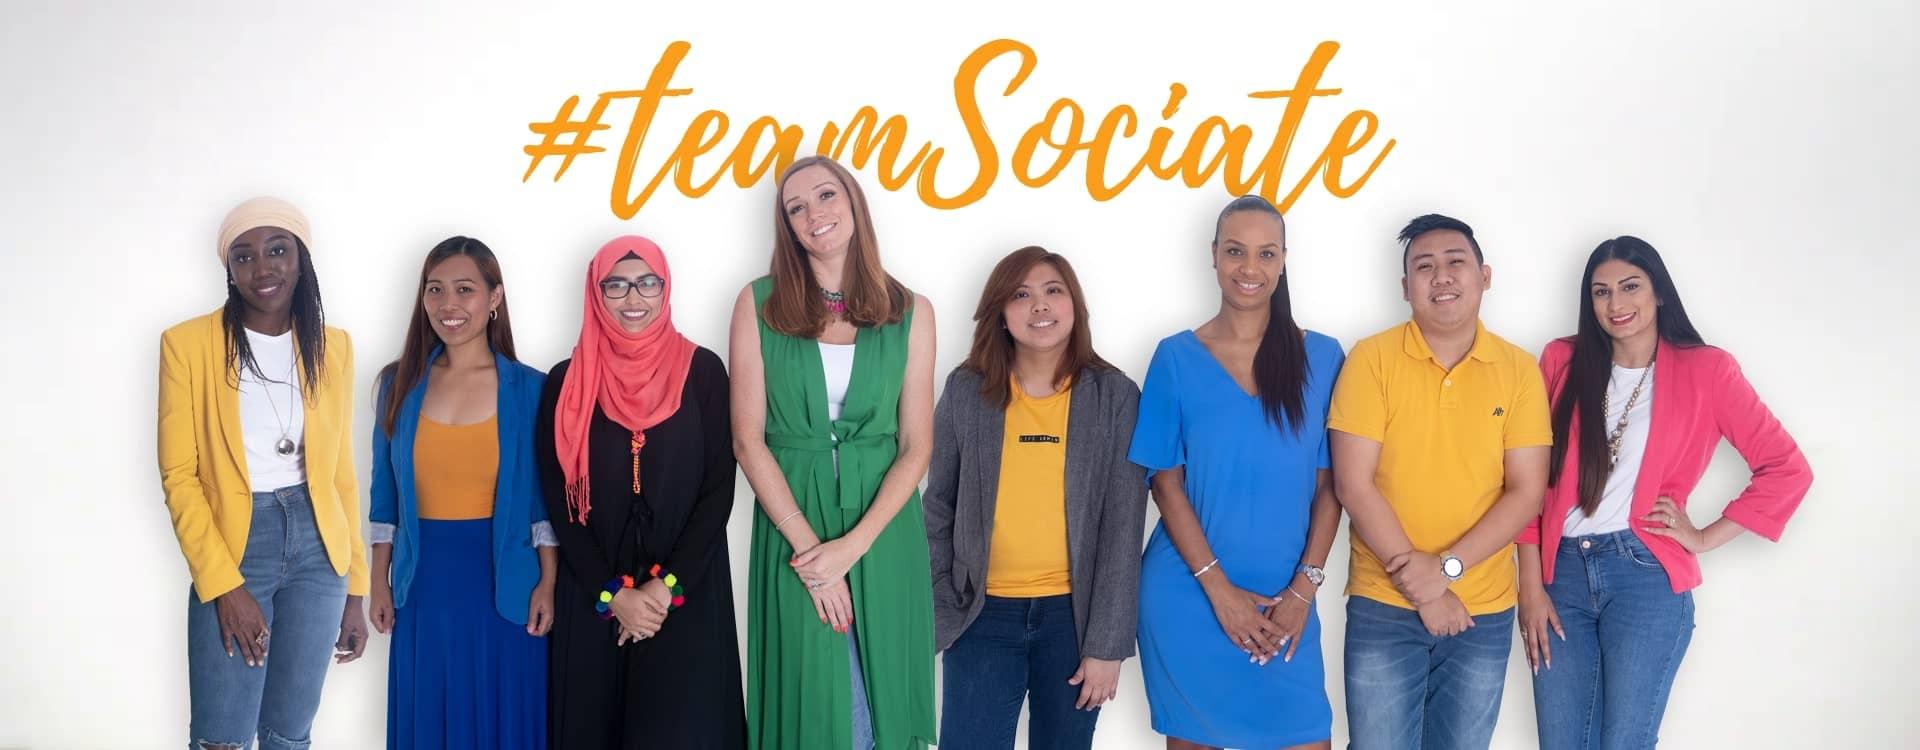 team sociate agency